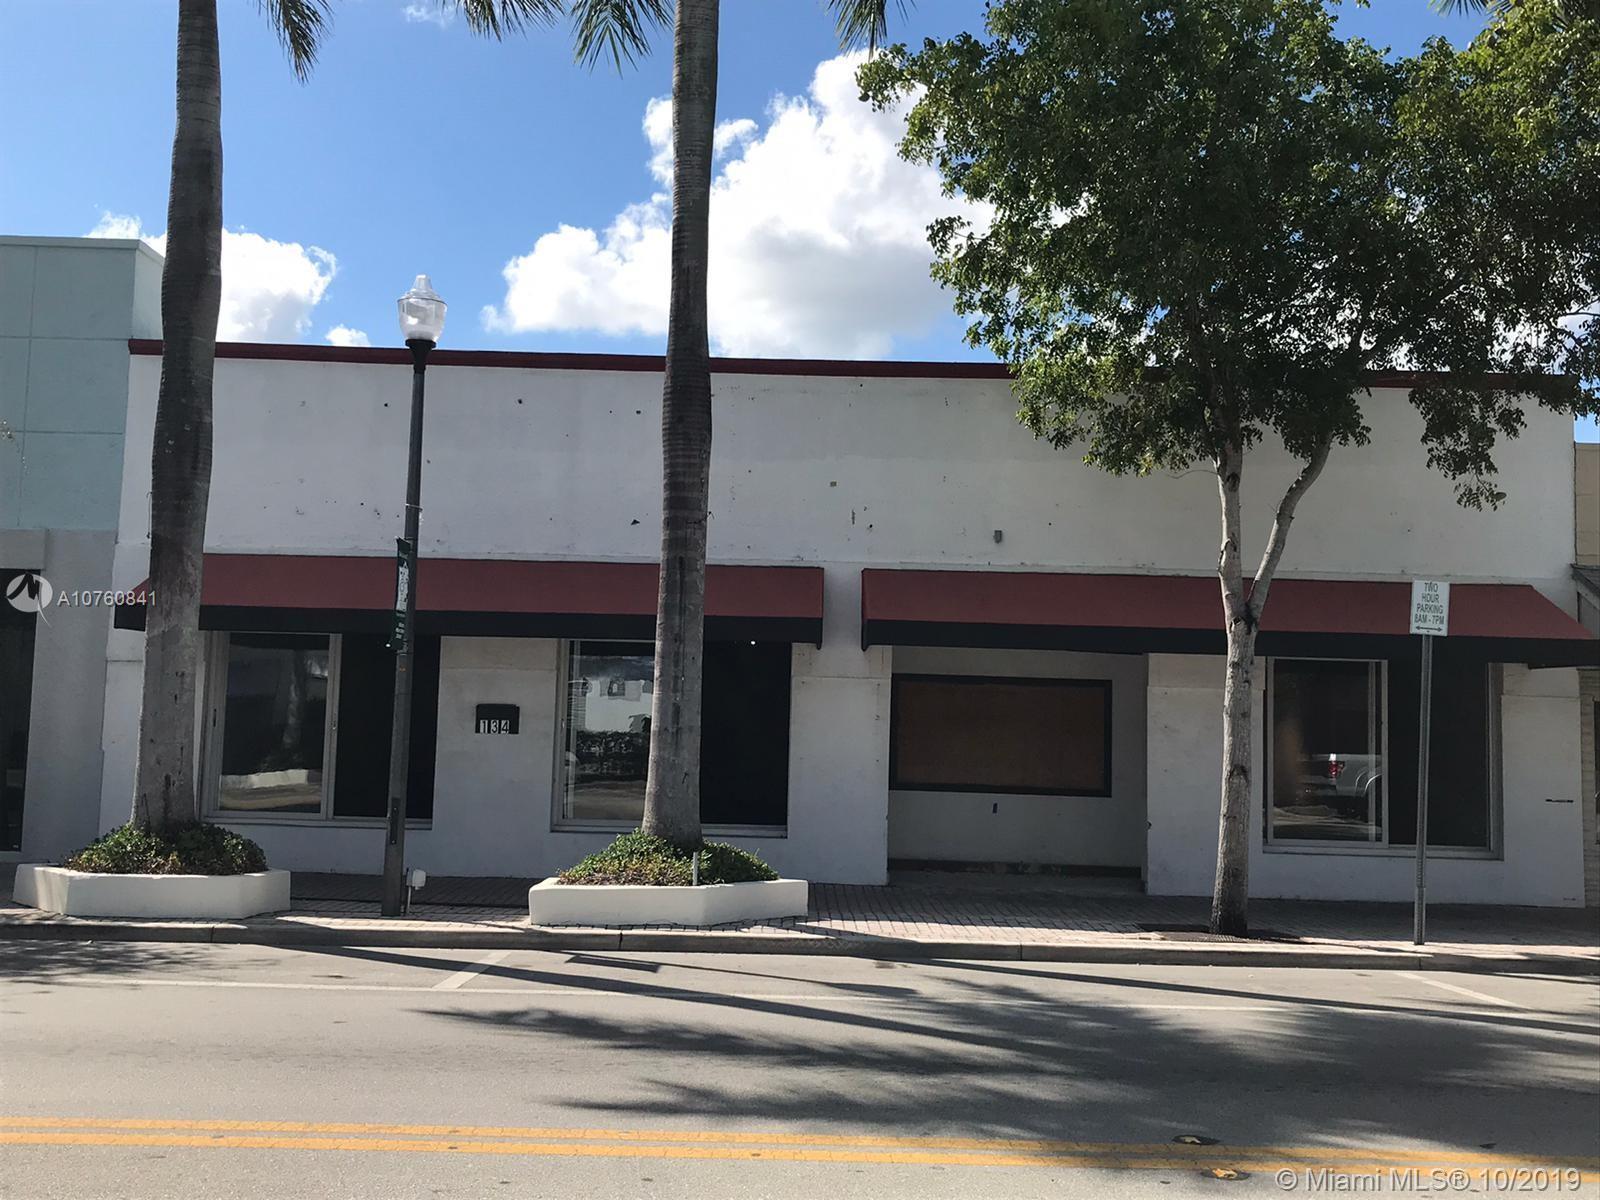 134 N Krome Ave, Homestead, FL 33030